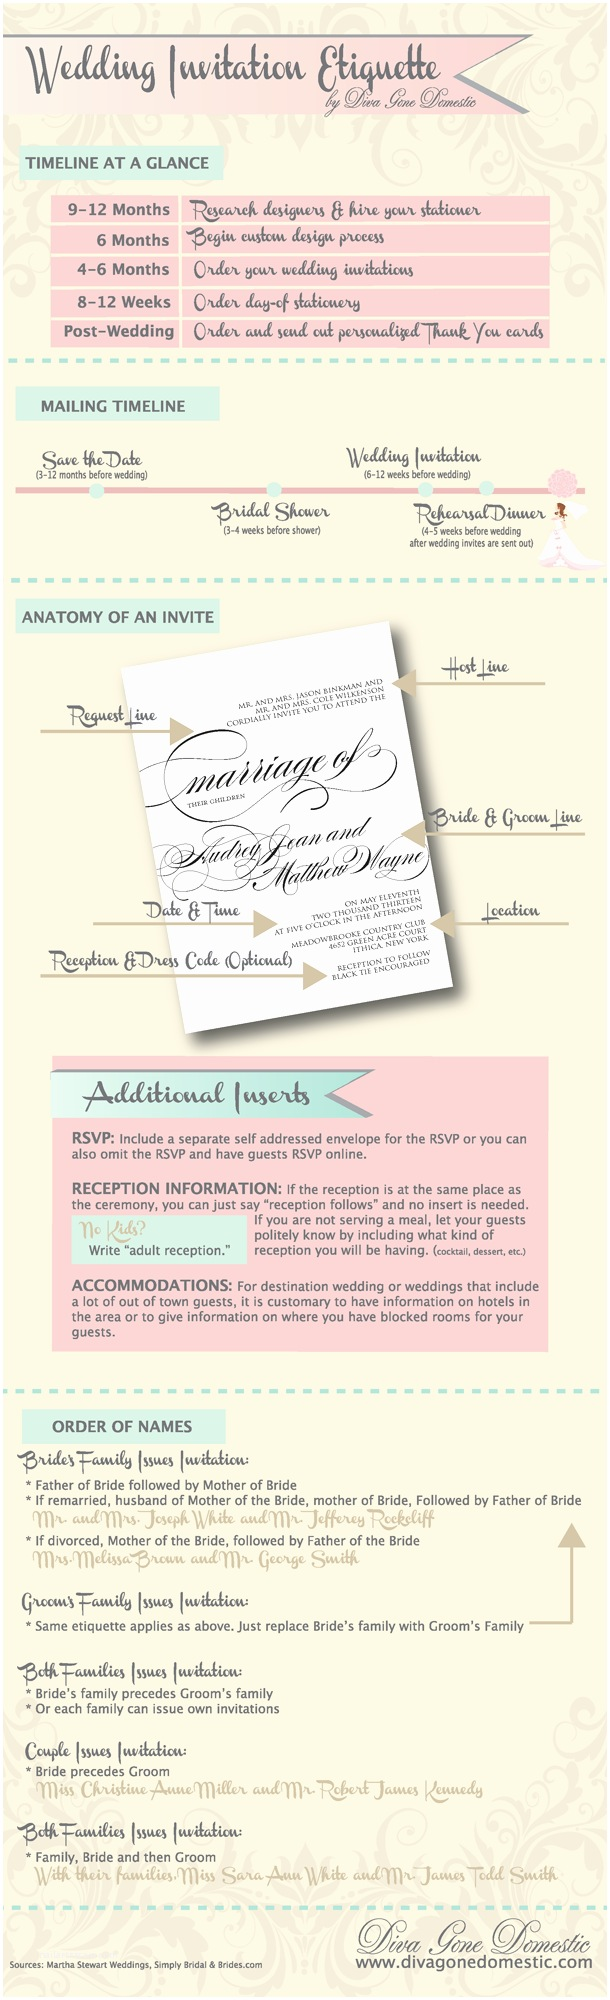 Wedding Invitation Etiquette 25 Informal Wedding Invitation Wording Ideas